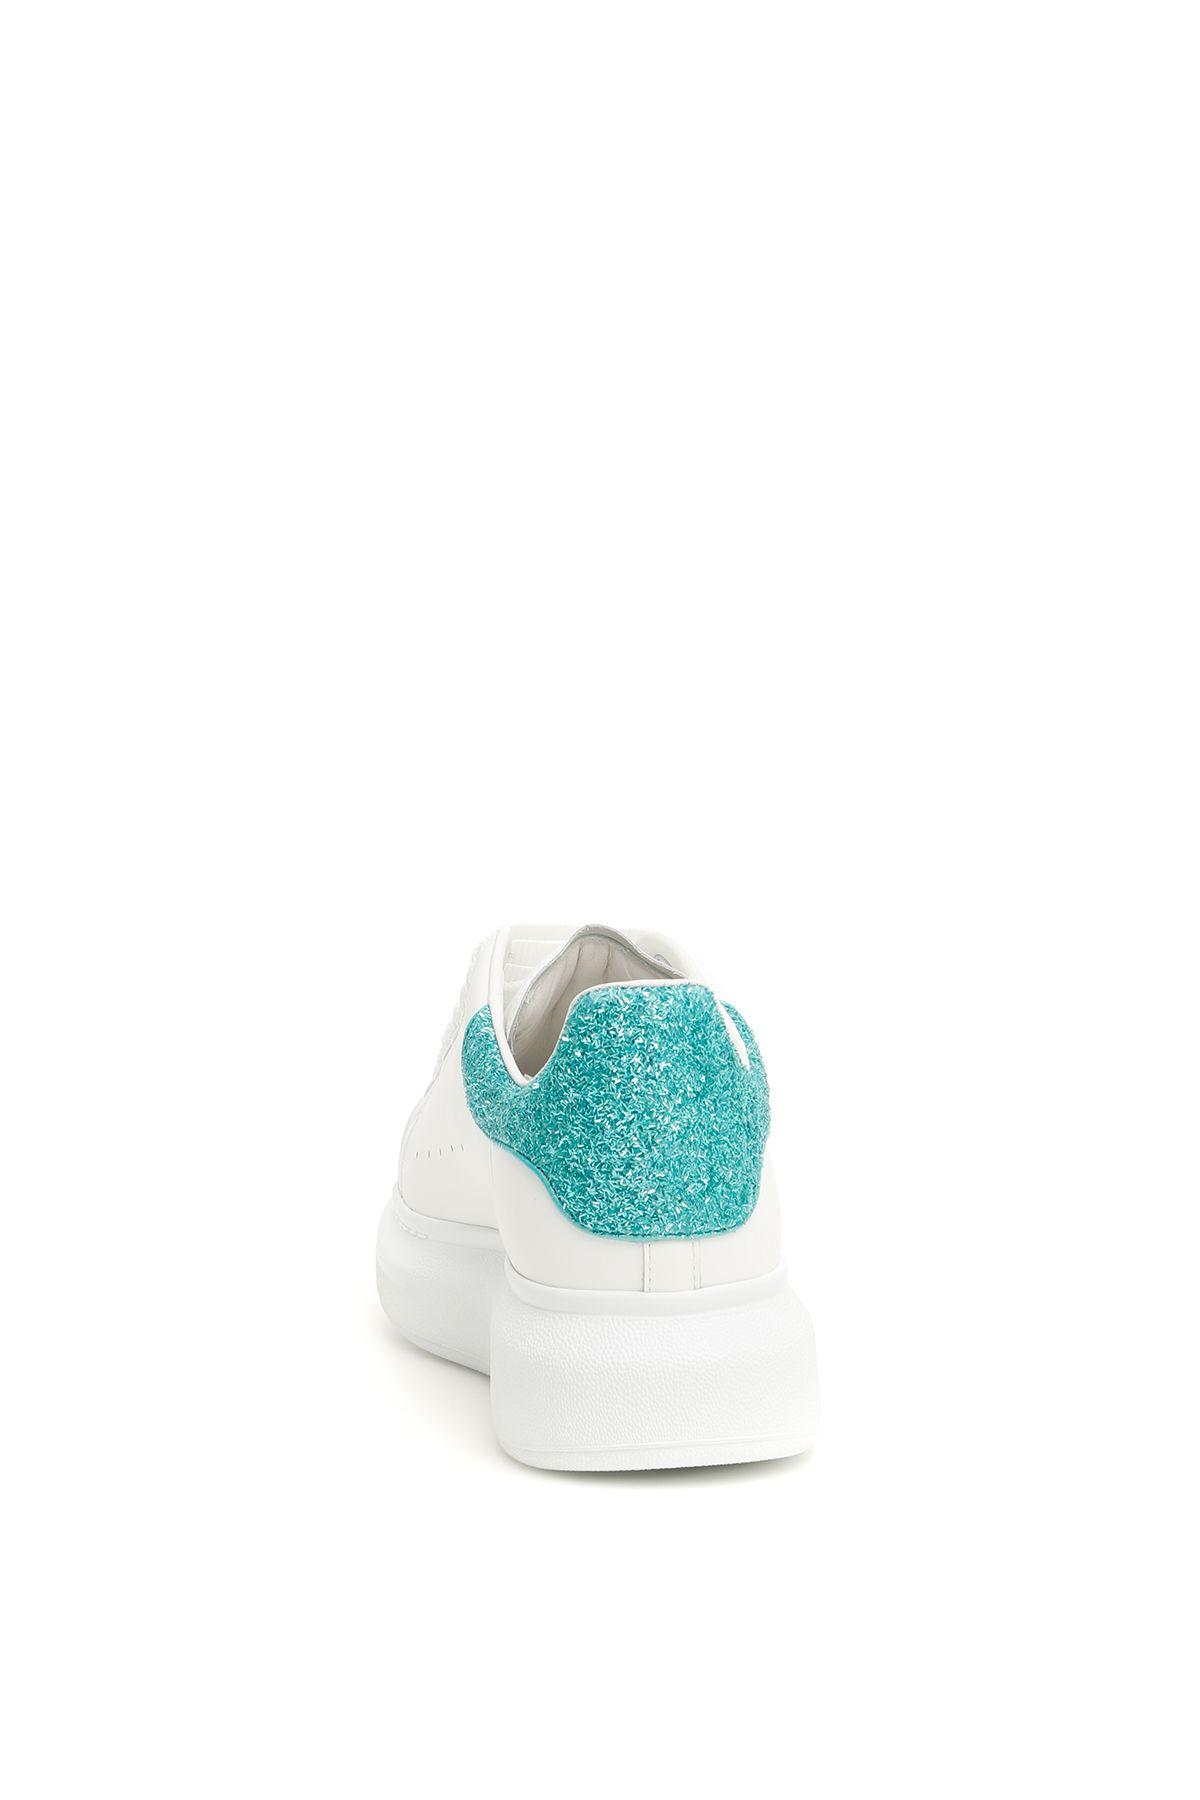 e26c7f6c3d09a8 ... Alexander McQueen Oversized Sneakers - WHITE EAU DN